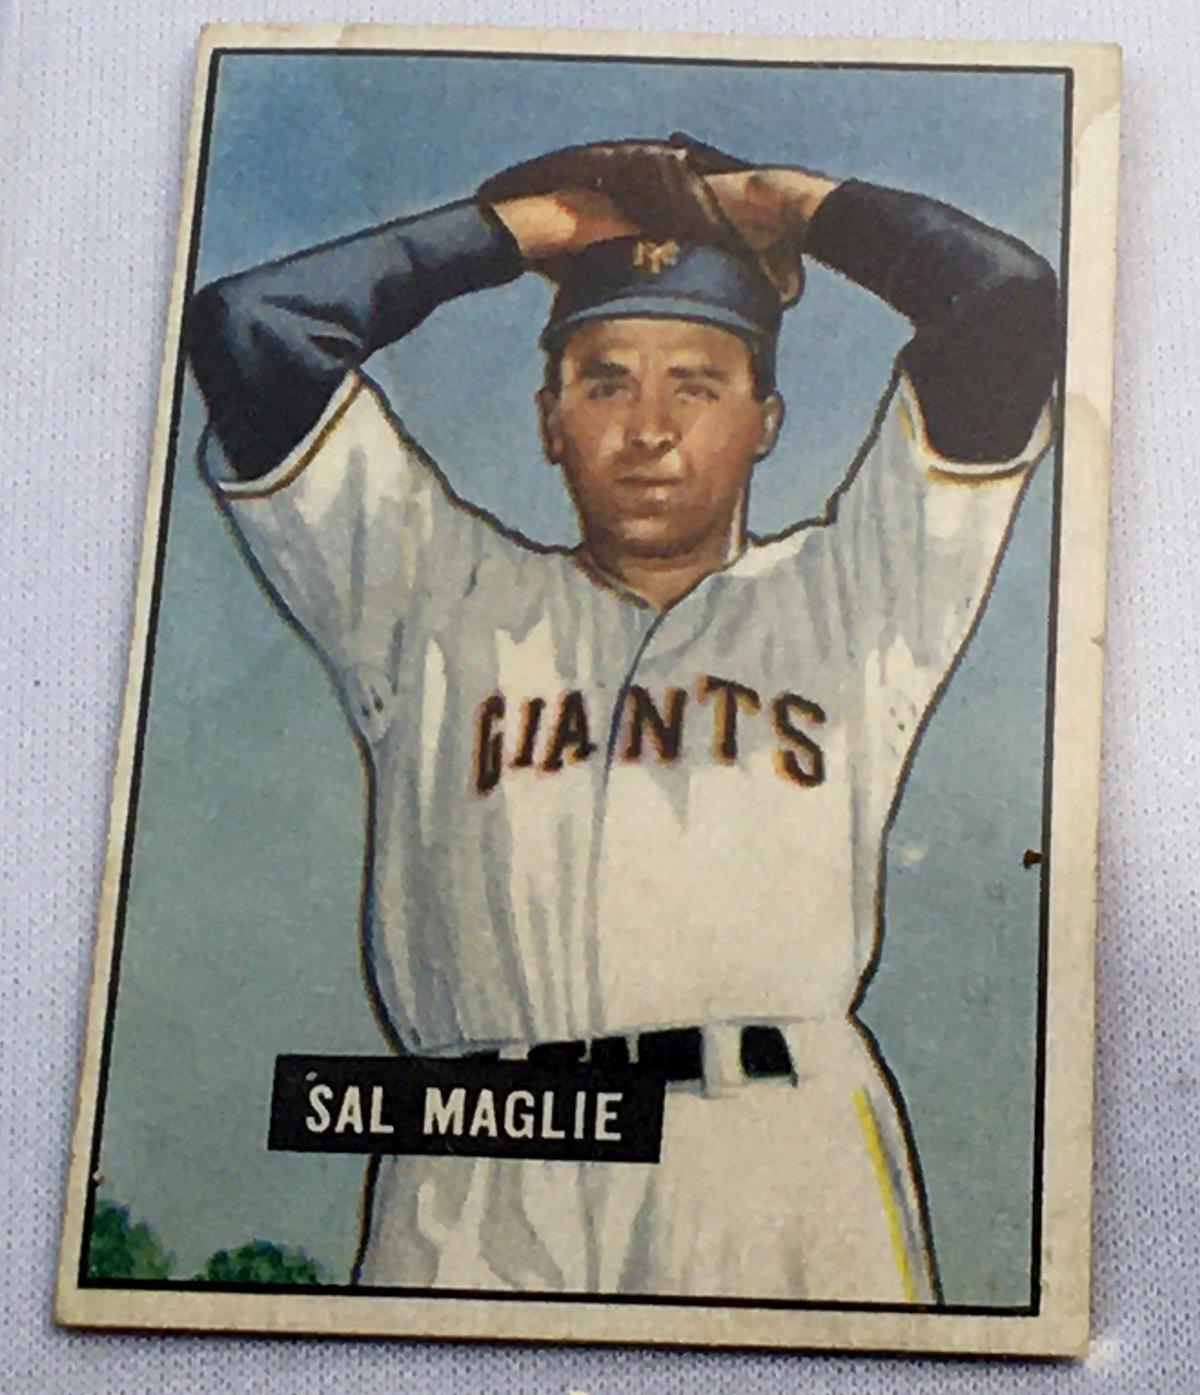 1951 Bowman #127 Sal Maglie New York Giants Rookie Card